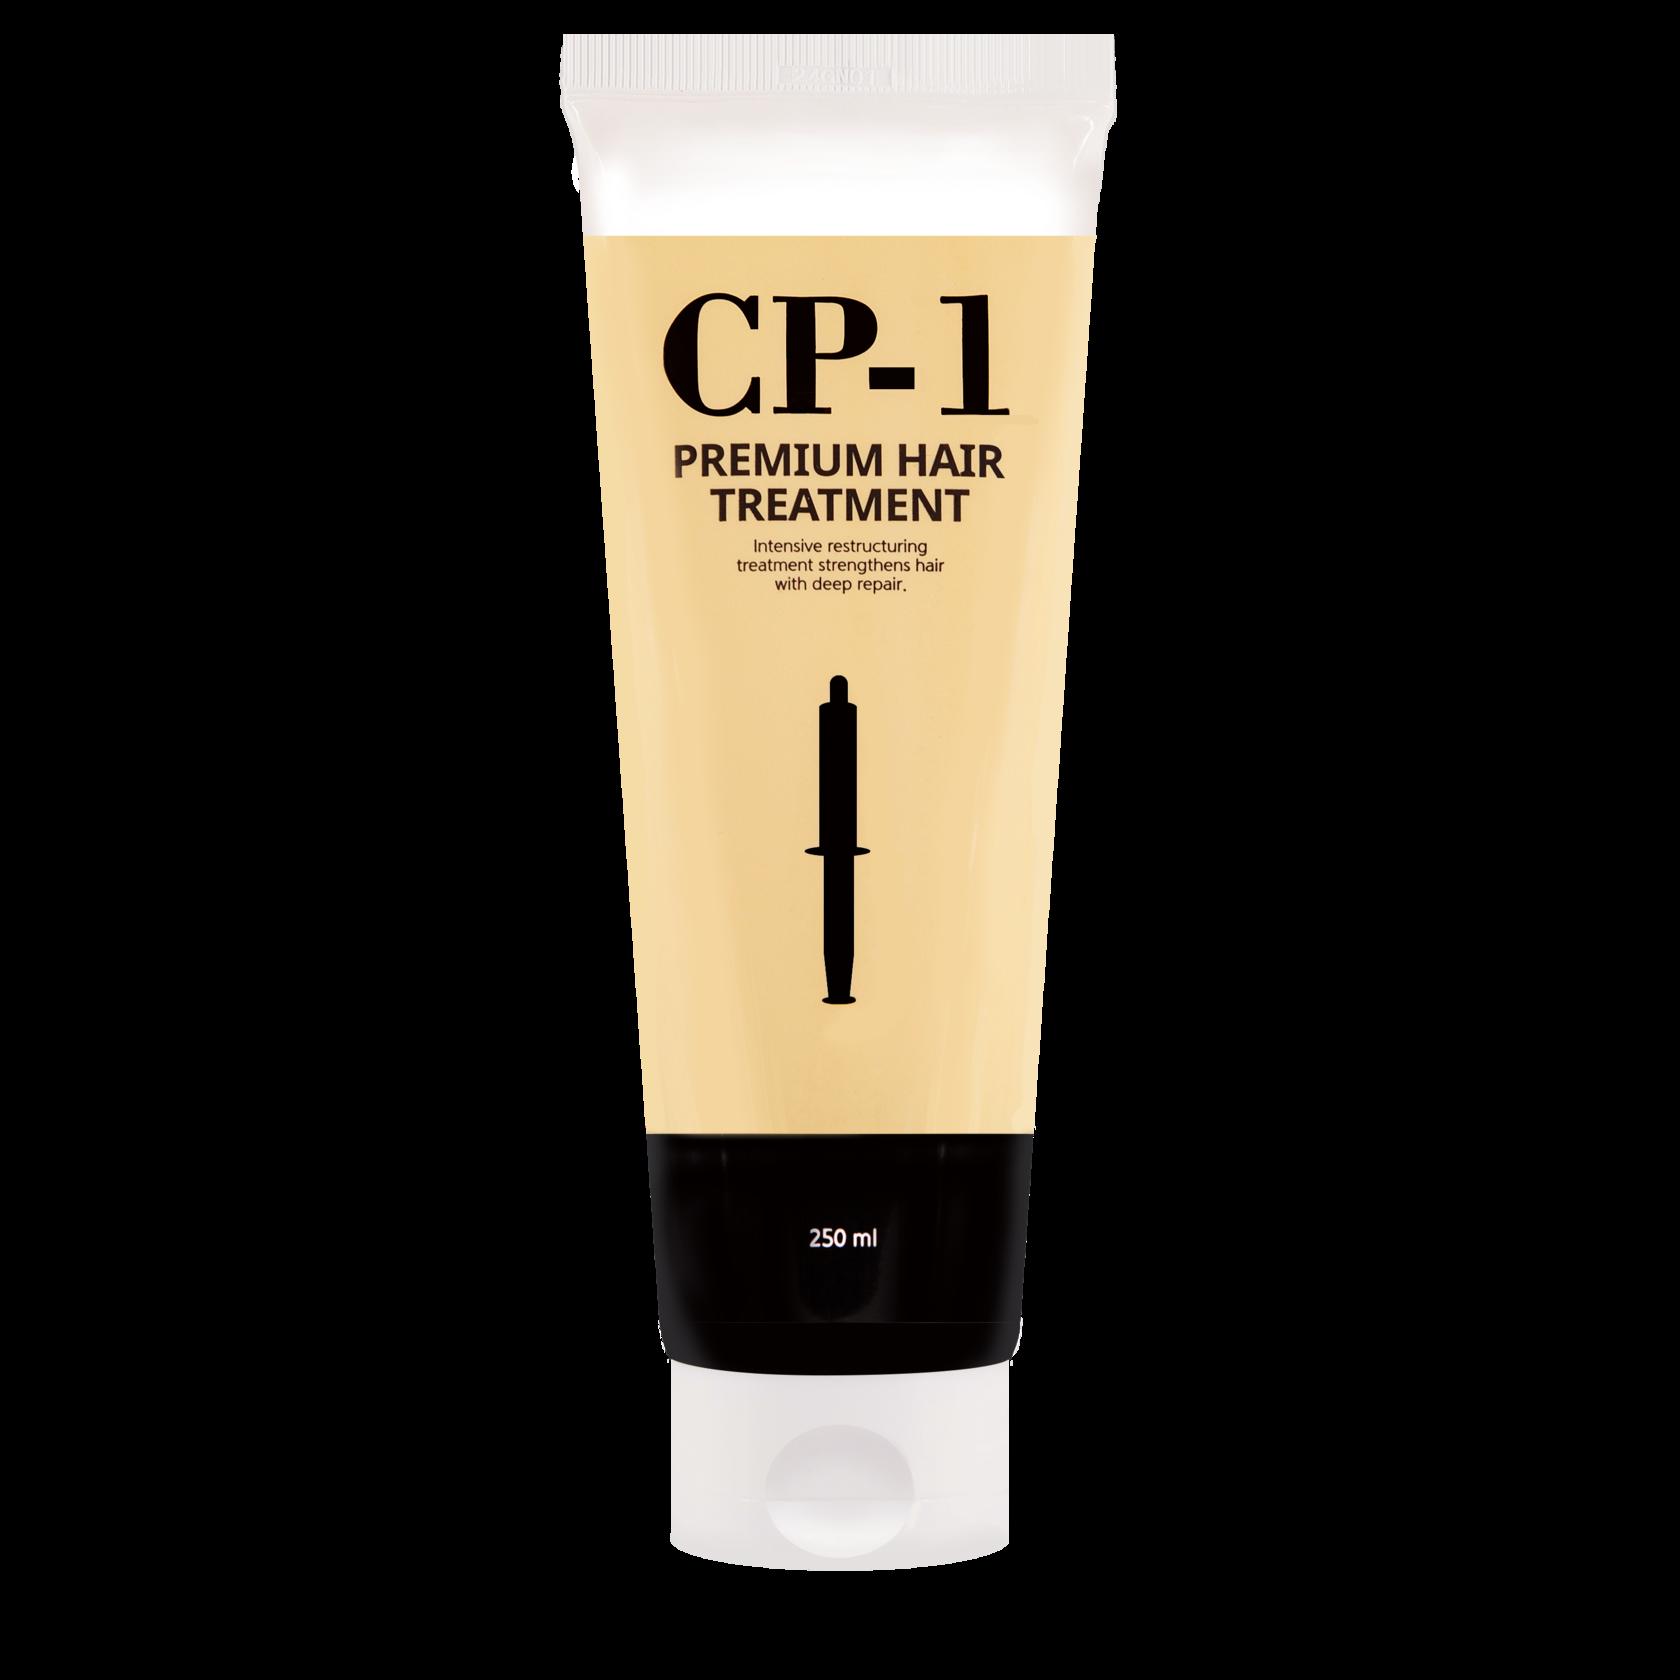 Протеиновая маска для волос Premium Protein Treatment CP-1 ESTHETIC HOUSE 250 мл